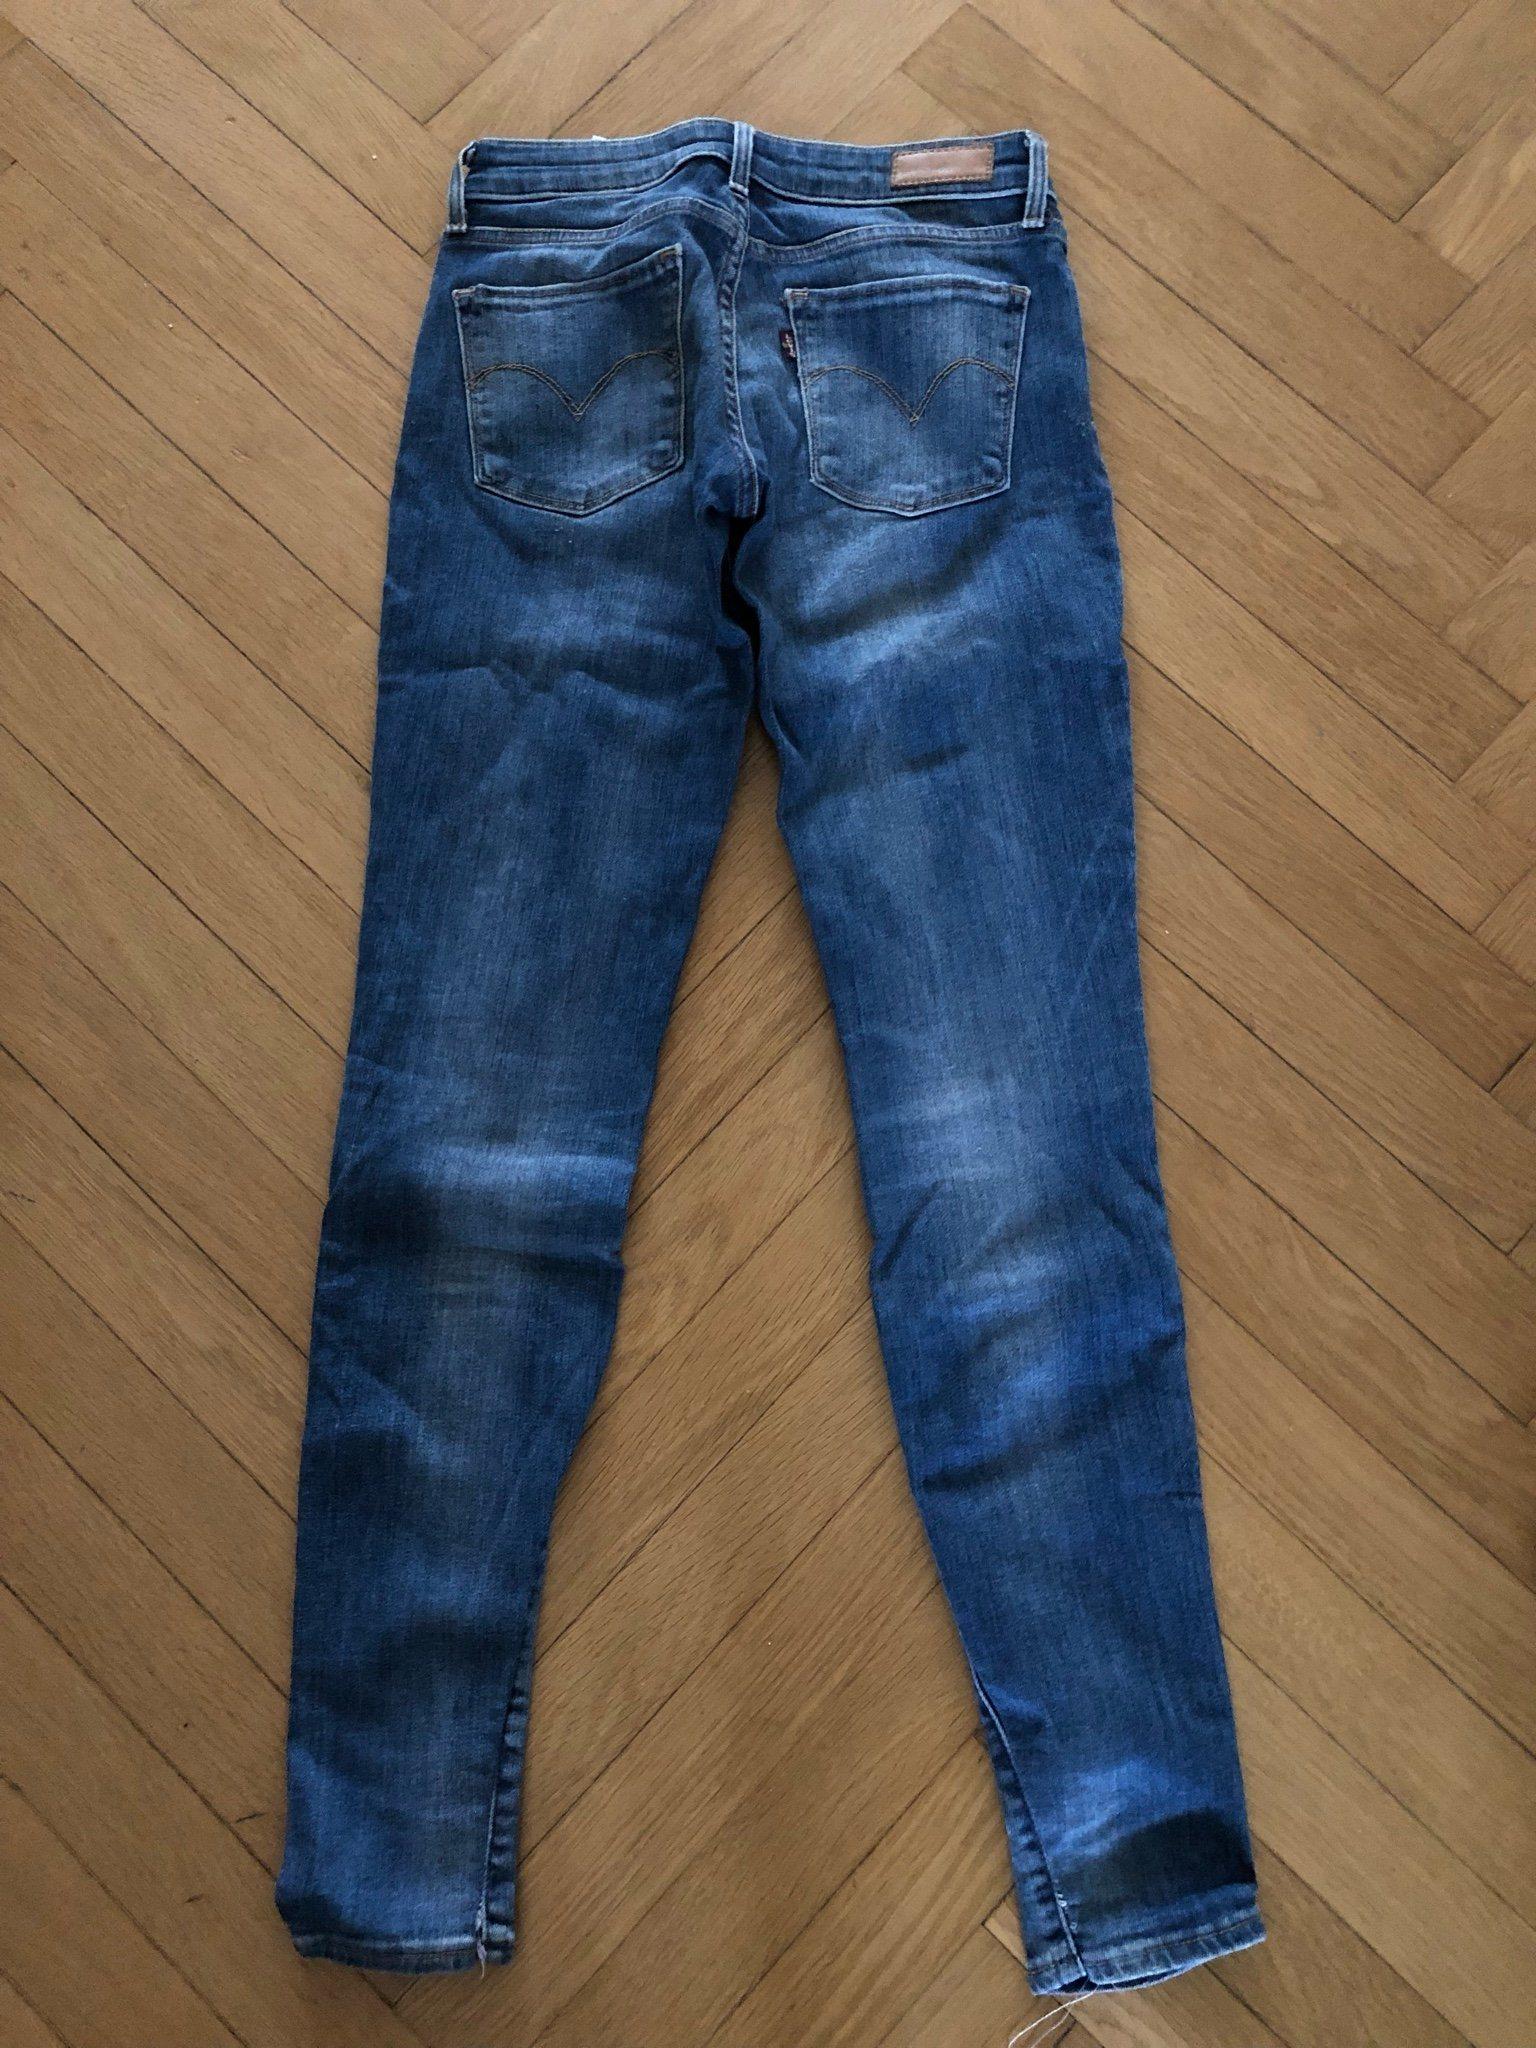 b91e59b1aba Levis jeans storlek 25 (342754043) ᐈ Köp på Tradera